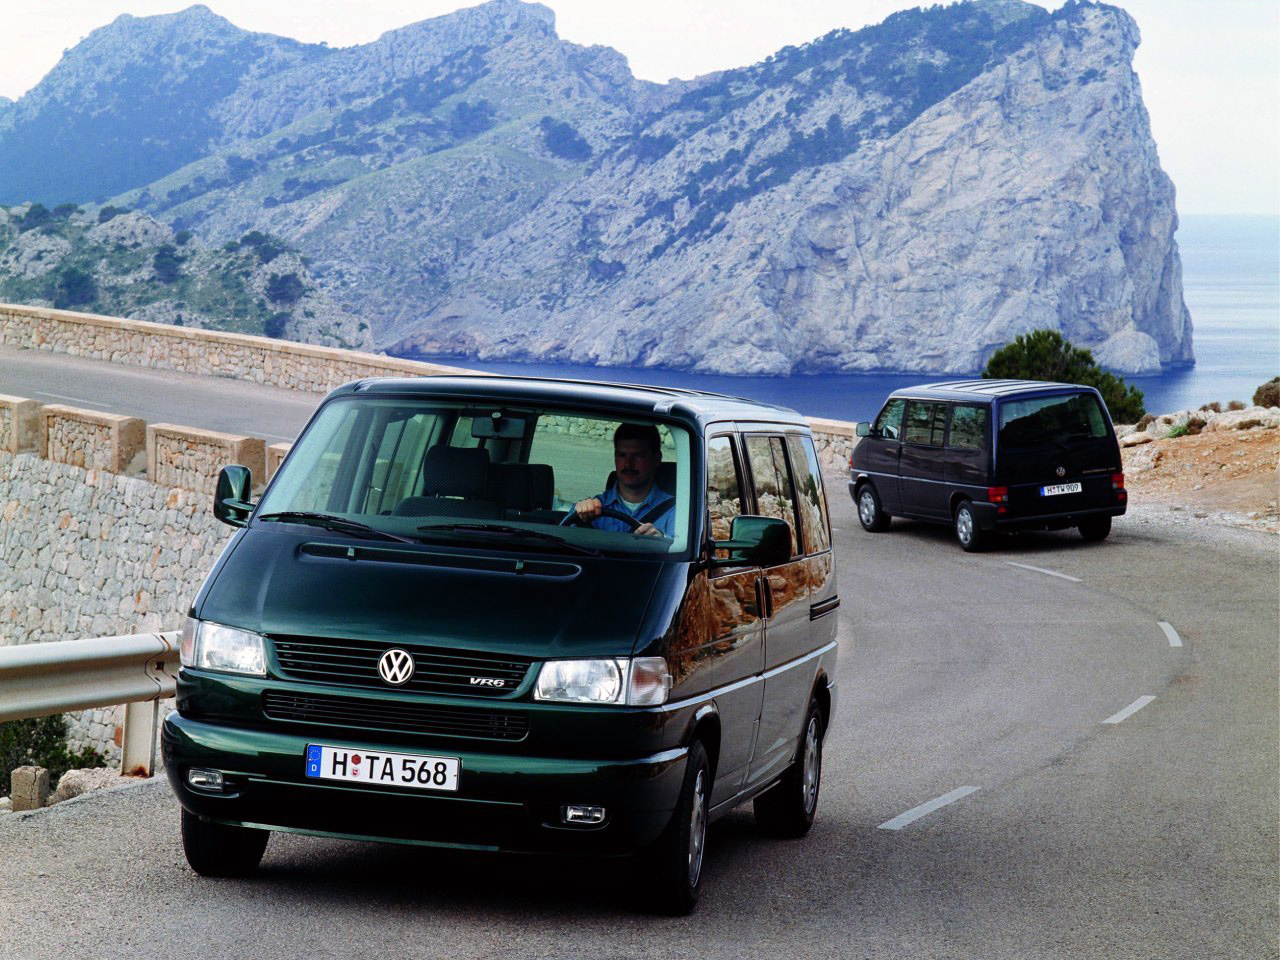 Минивэн Volkswagen T4 Caravelle. 1996 - 2003 годы